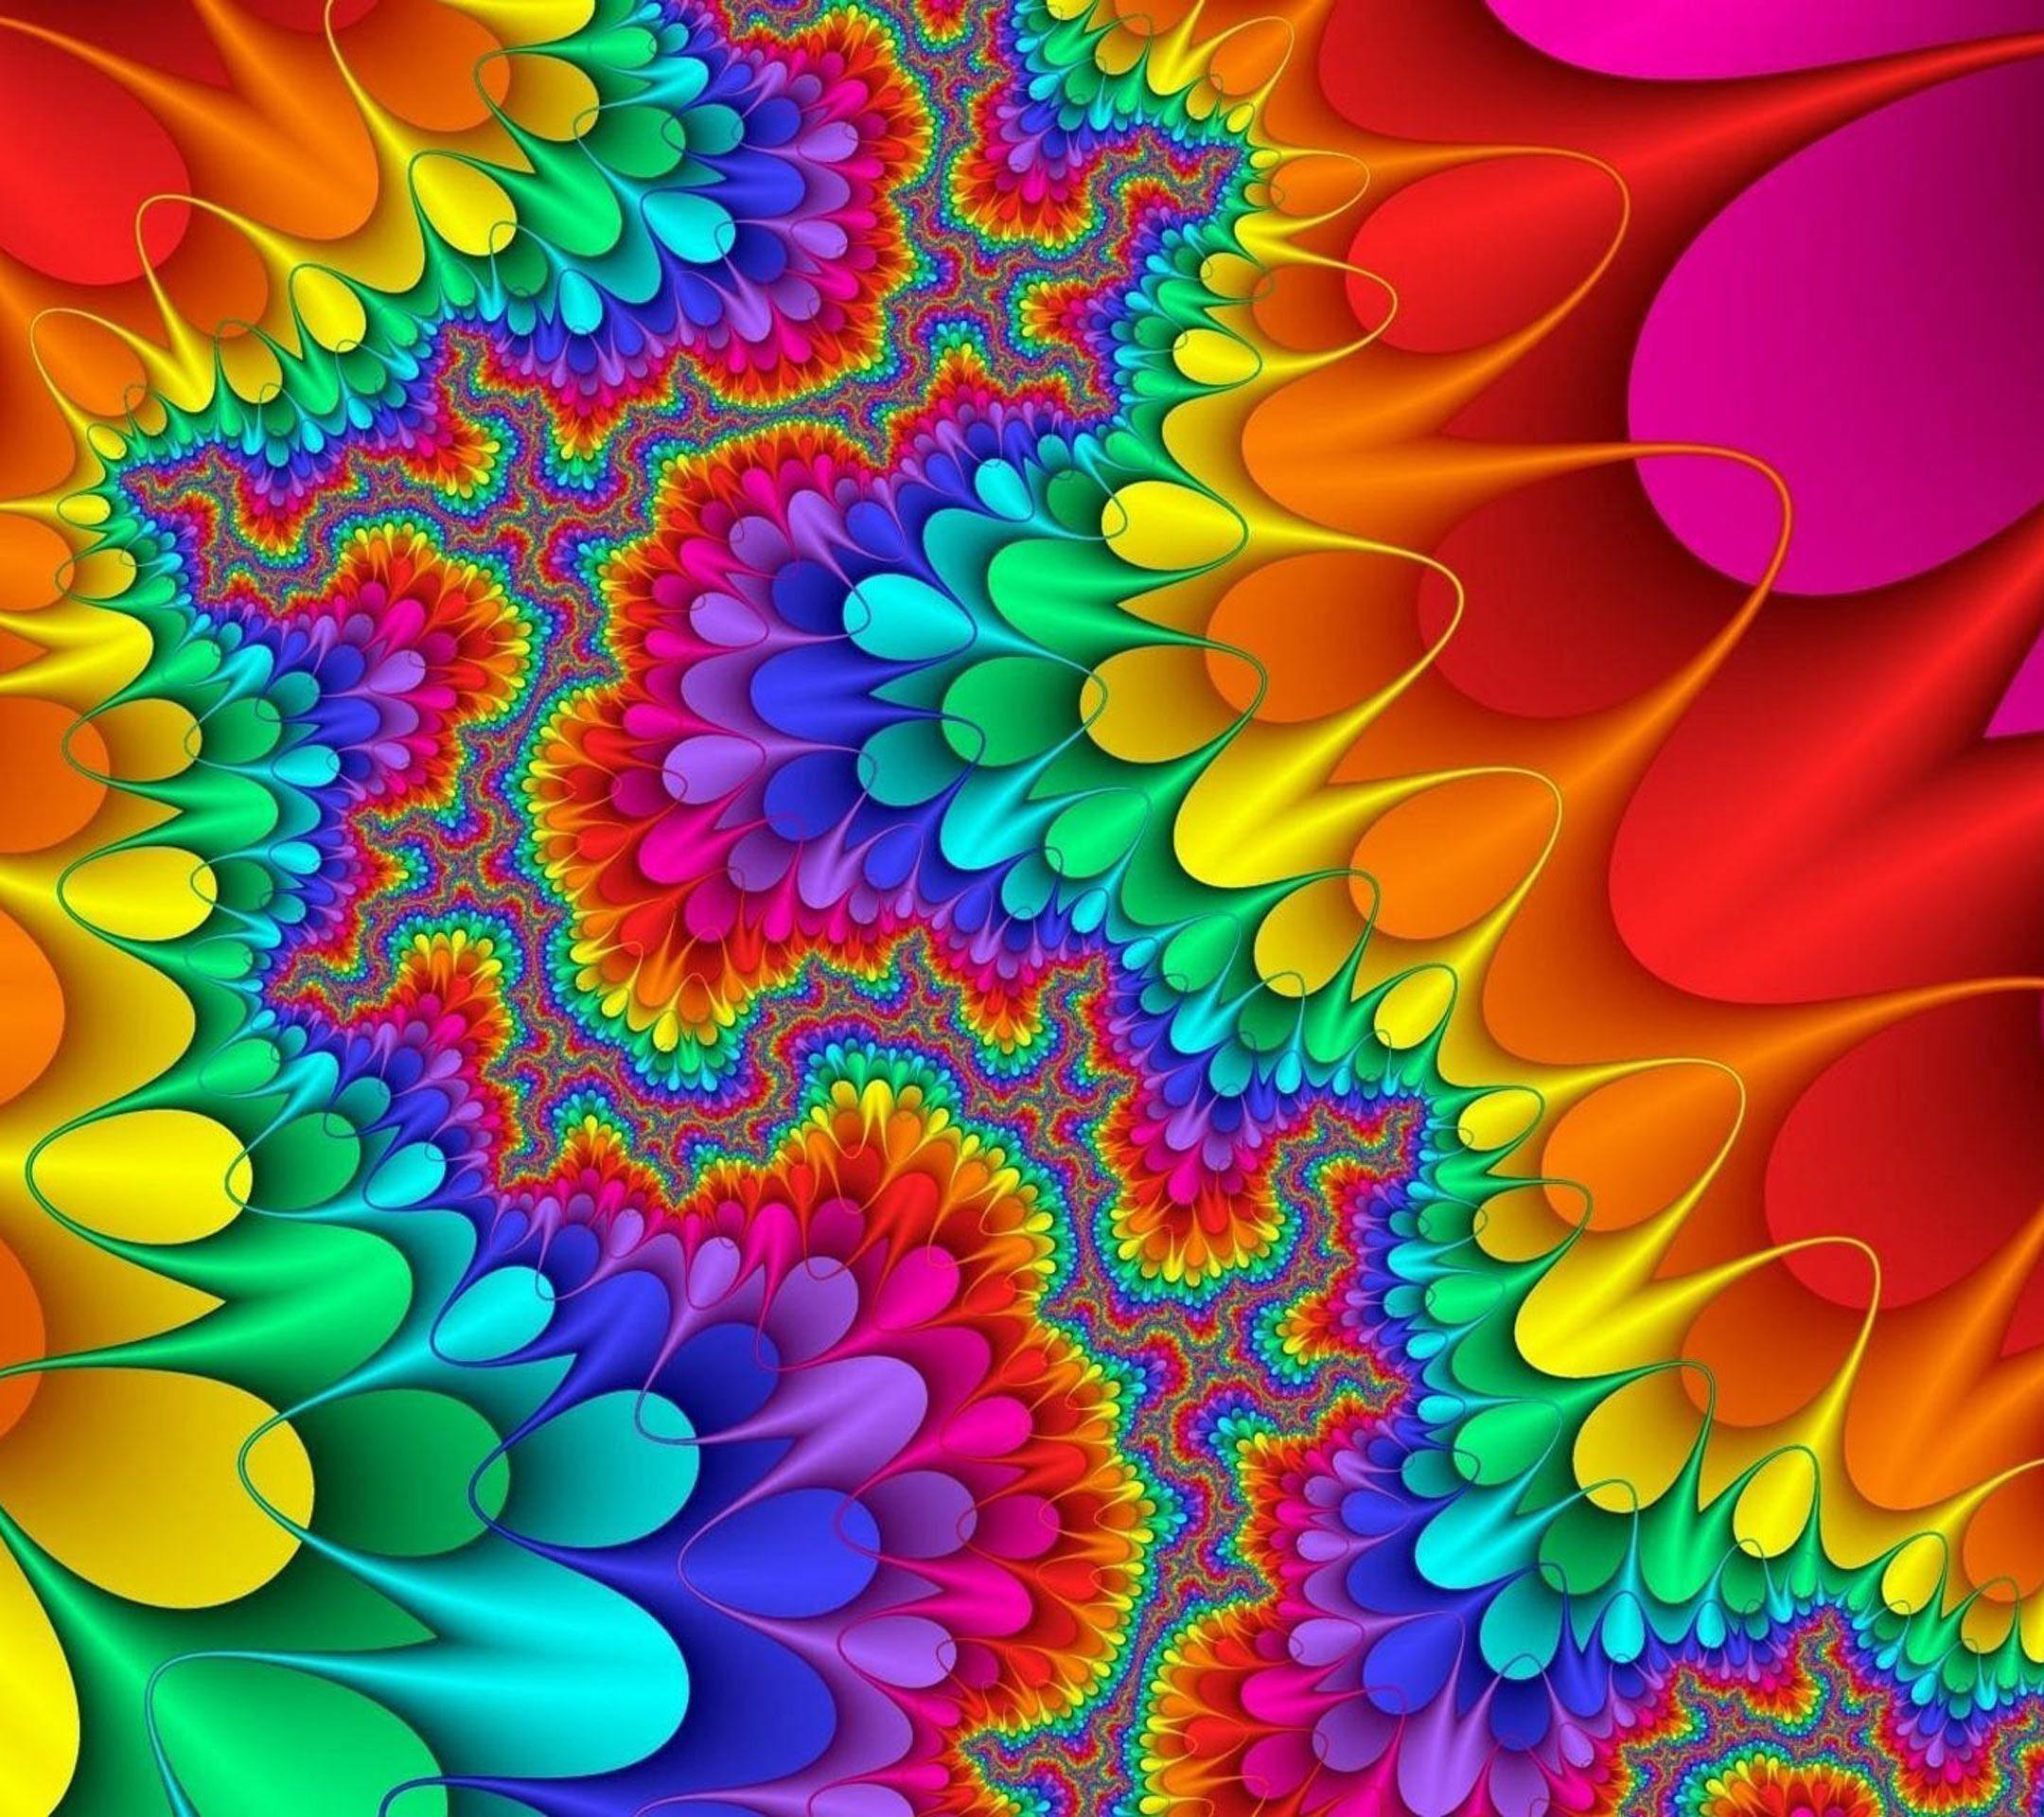 Color Wallpapers Wallpaper Cave